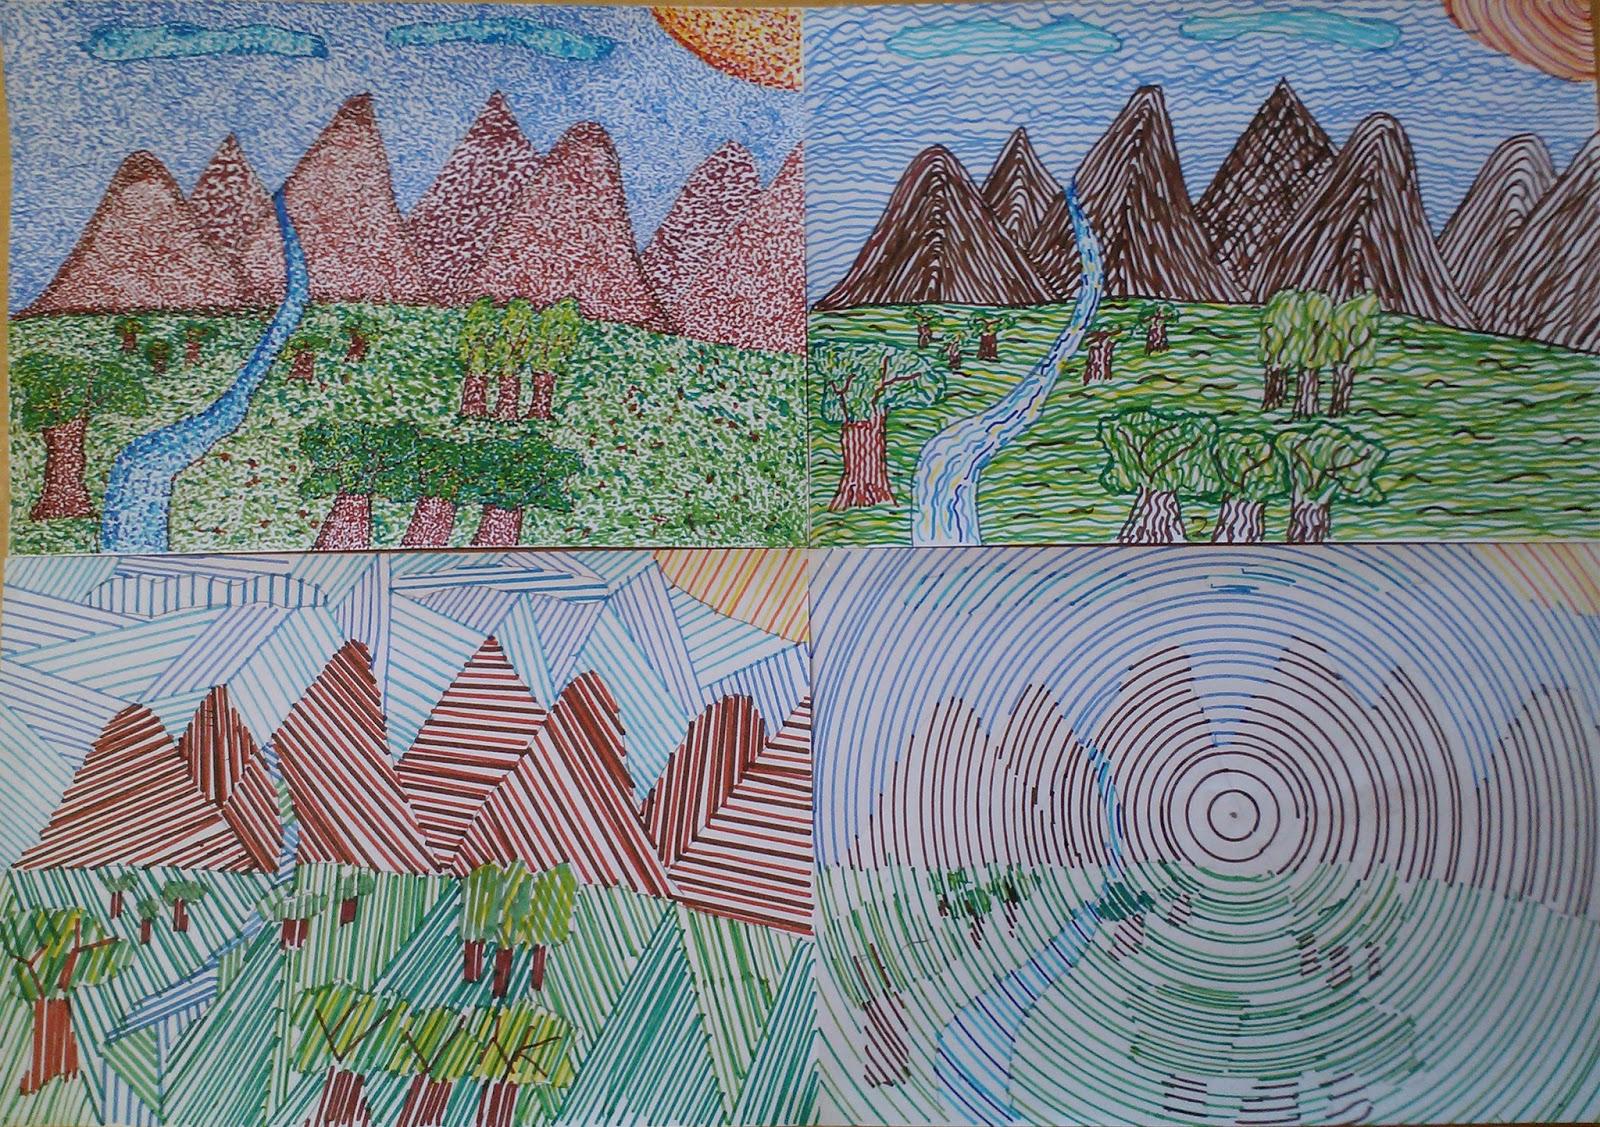 Dibujo De Lineas Paisaje: Dibujos De Paisajes Con Lineas